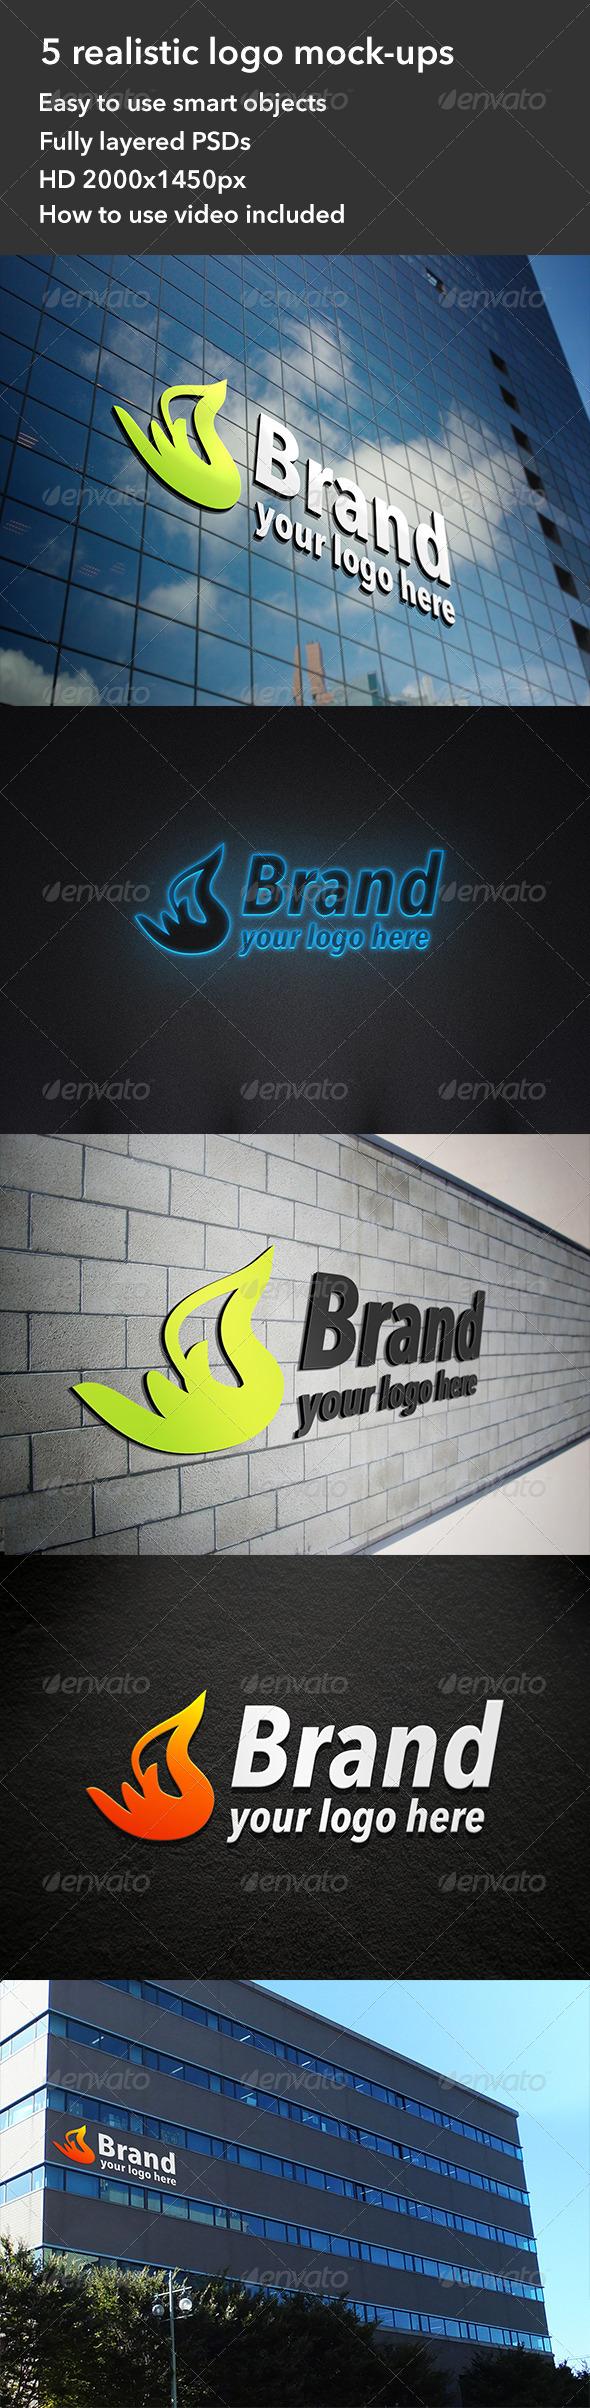 GraphicRiver 5 Realistic Interior & Exterior Logo Mockups 4438862